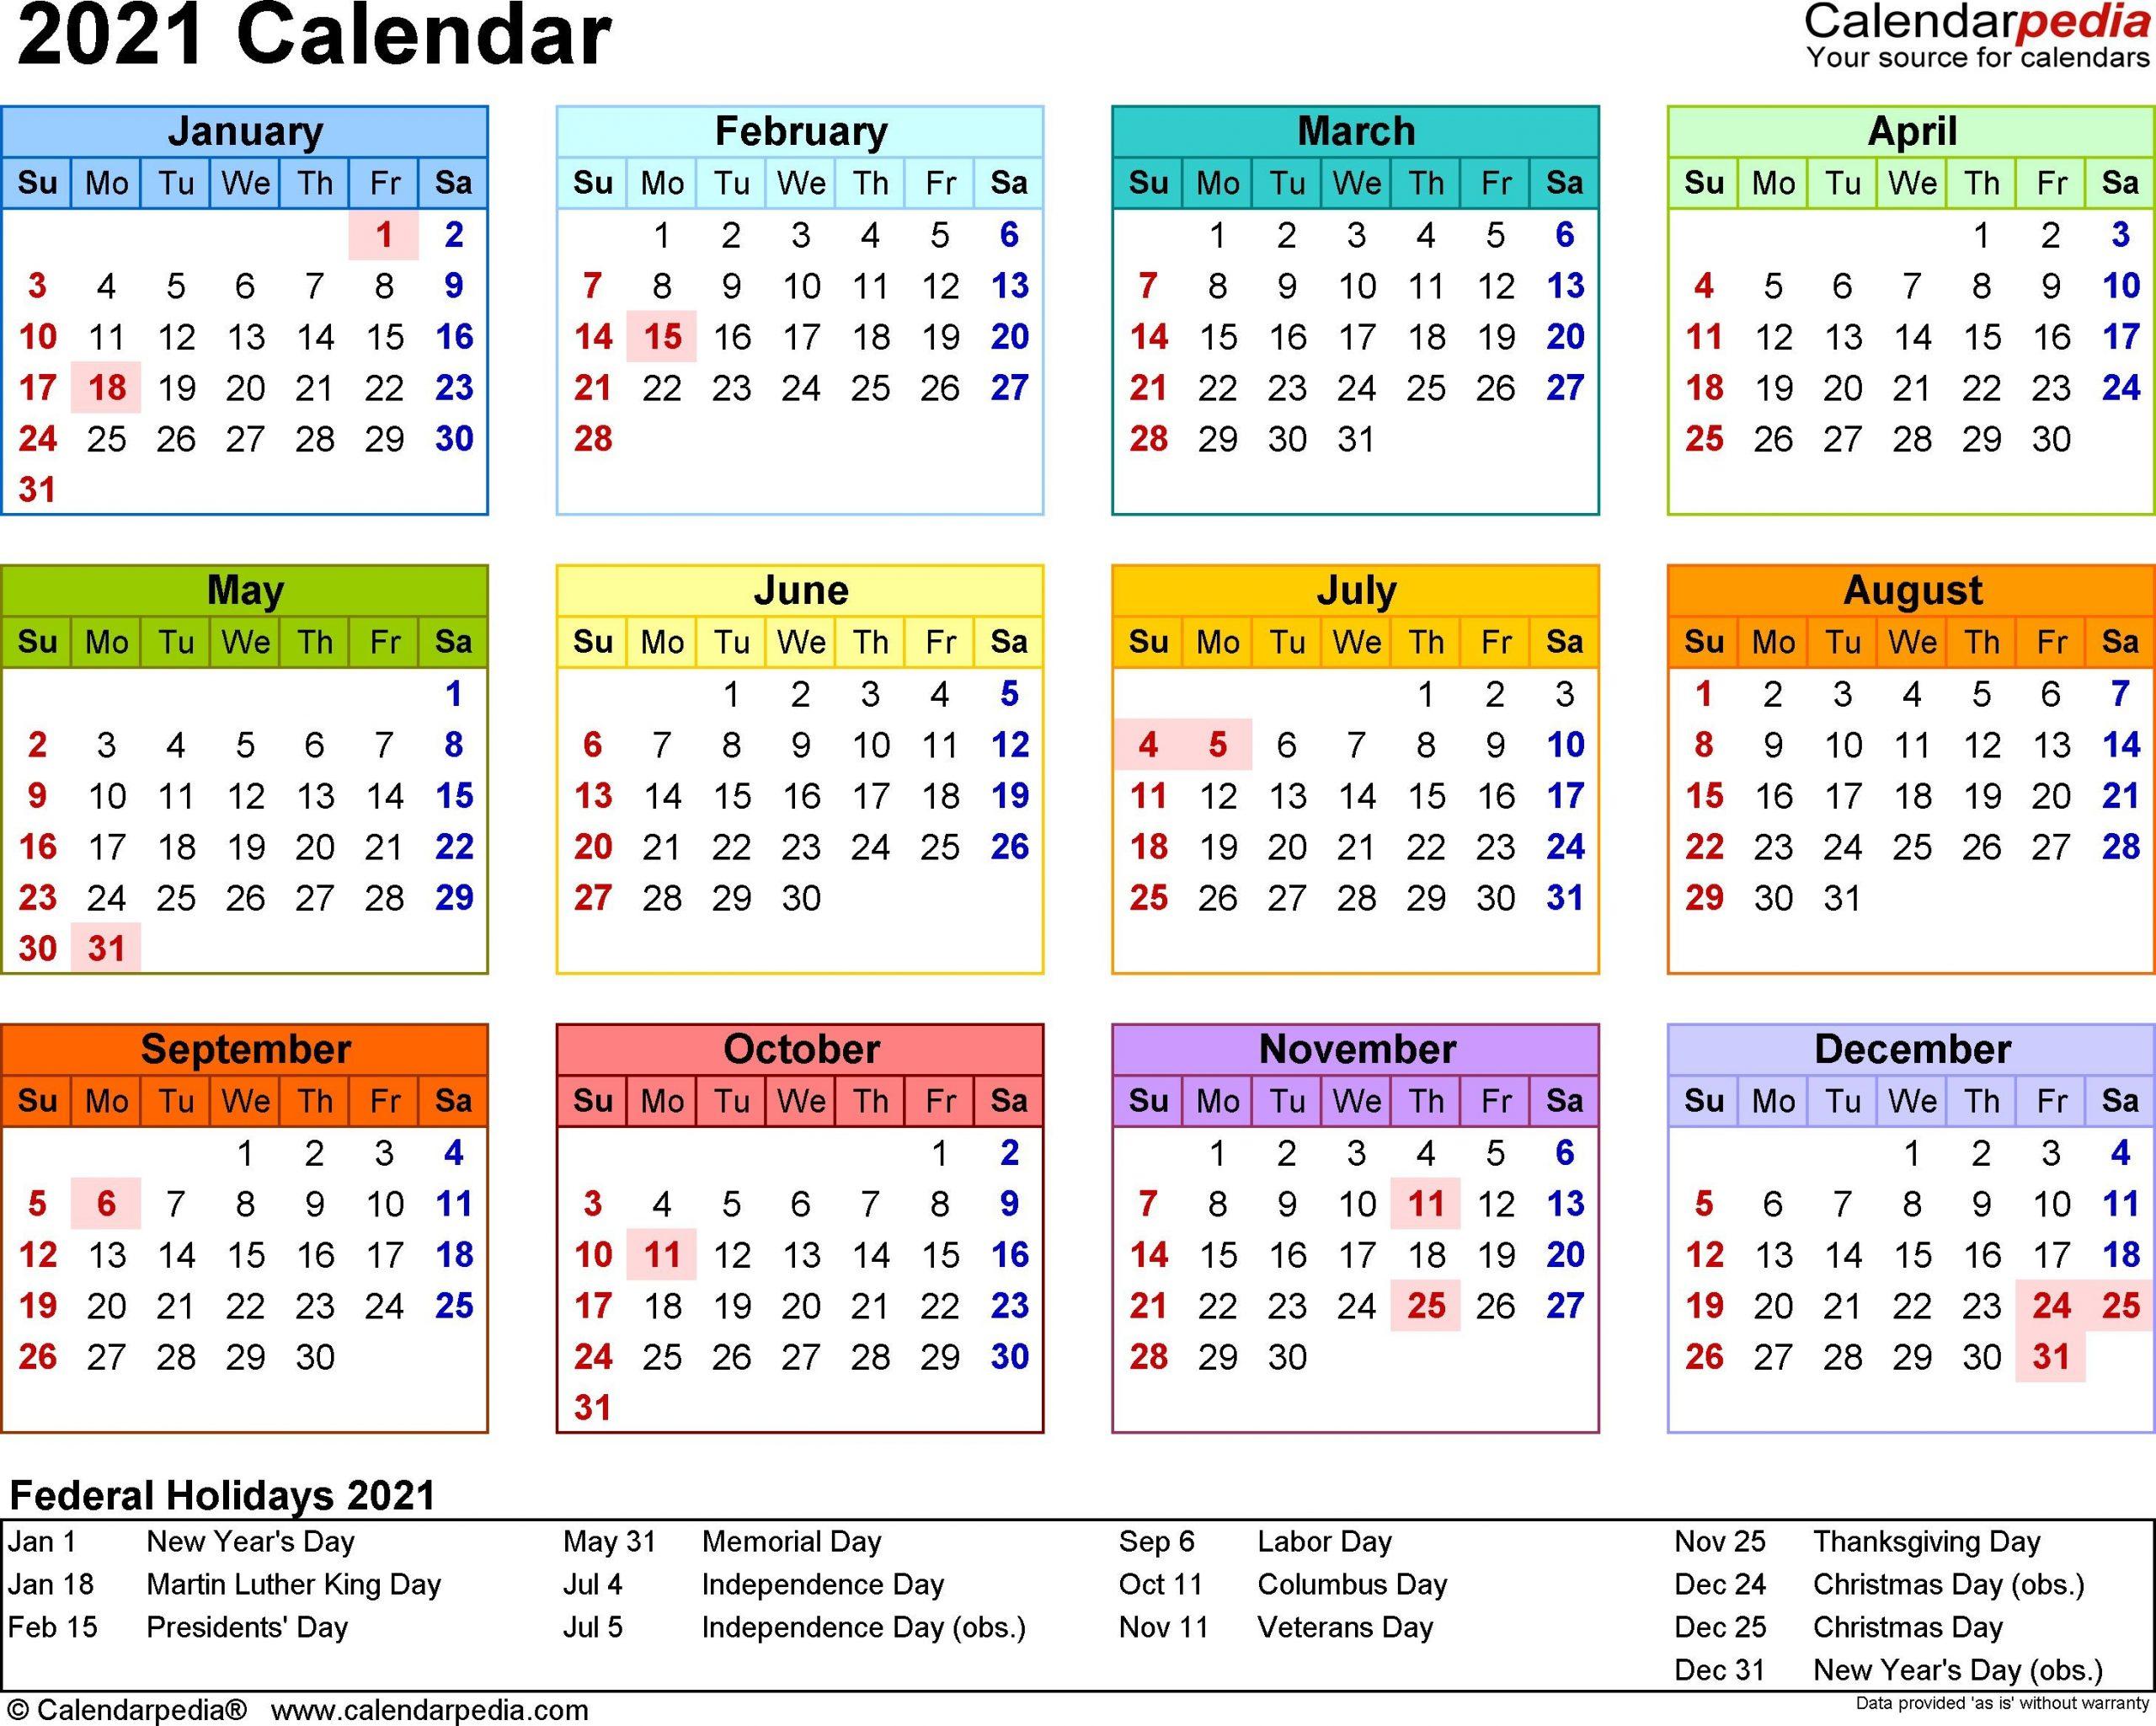 2021 Calendar Template 3 Year Calendar Full Page